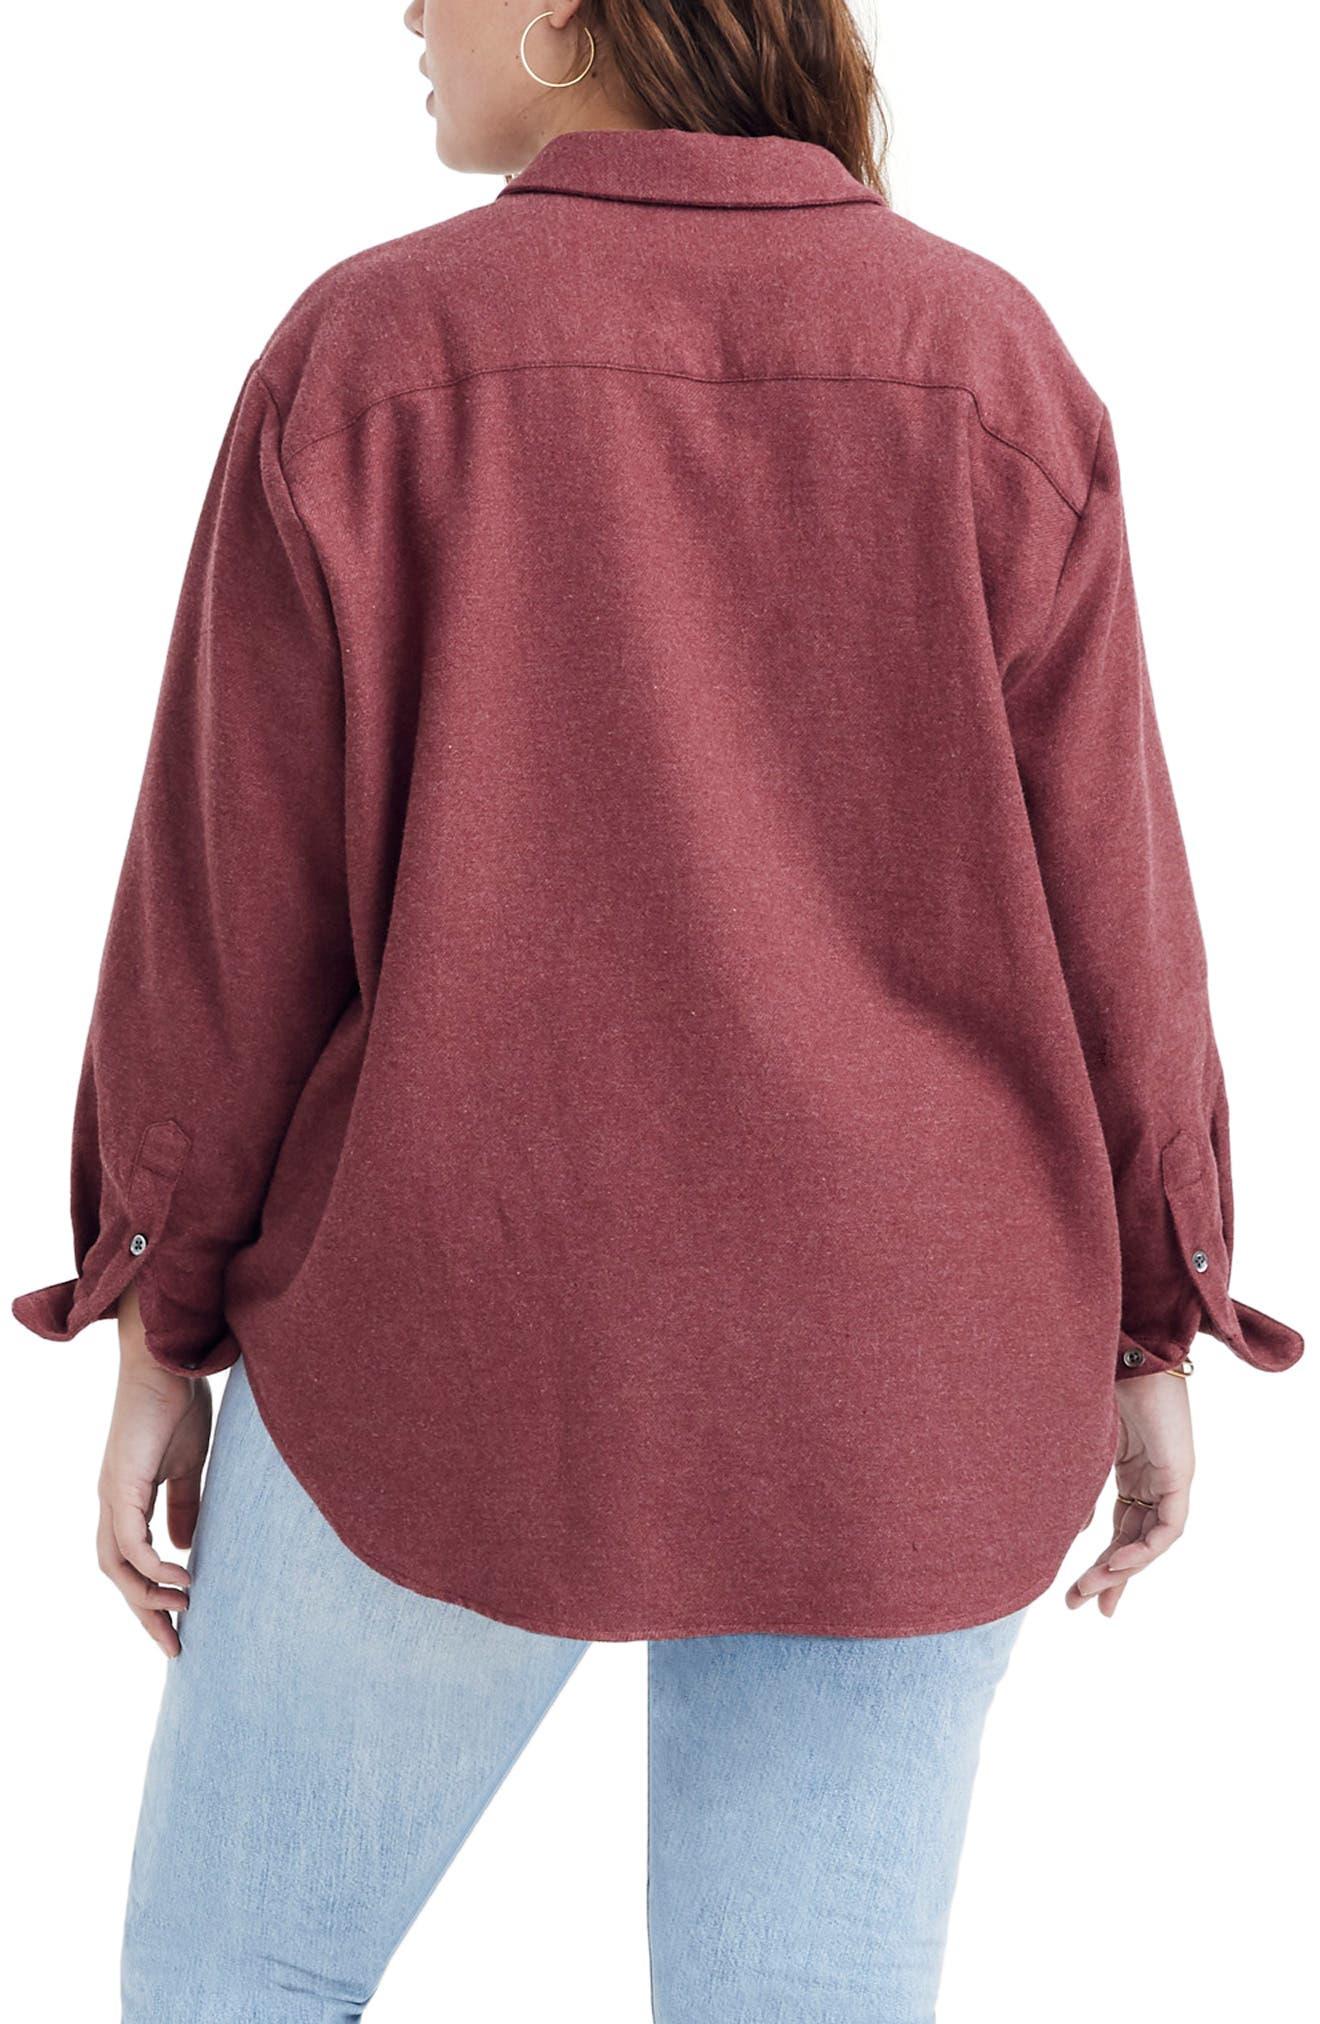 MADEWELL,                             Flannel Sunday Shirt,                             Alternate thumbnail 7, color,                             600